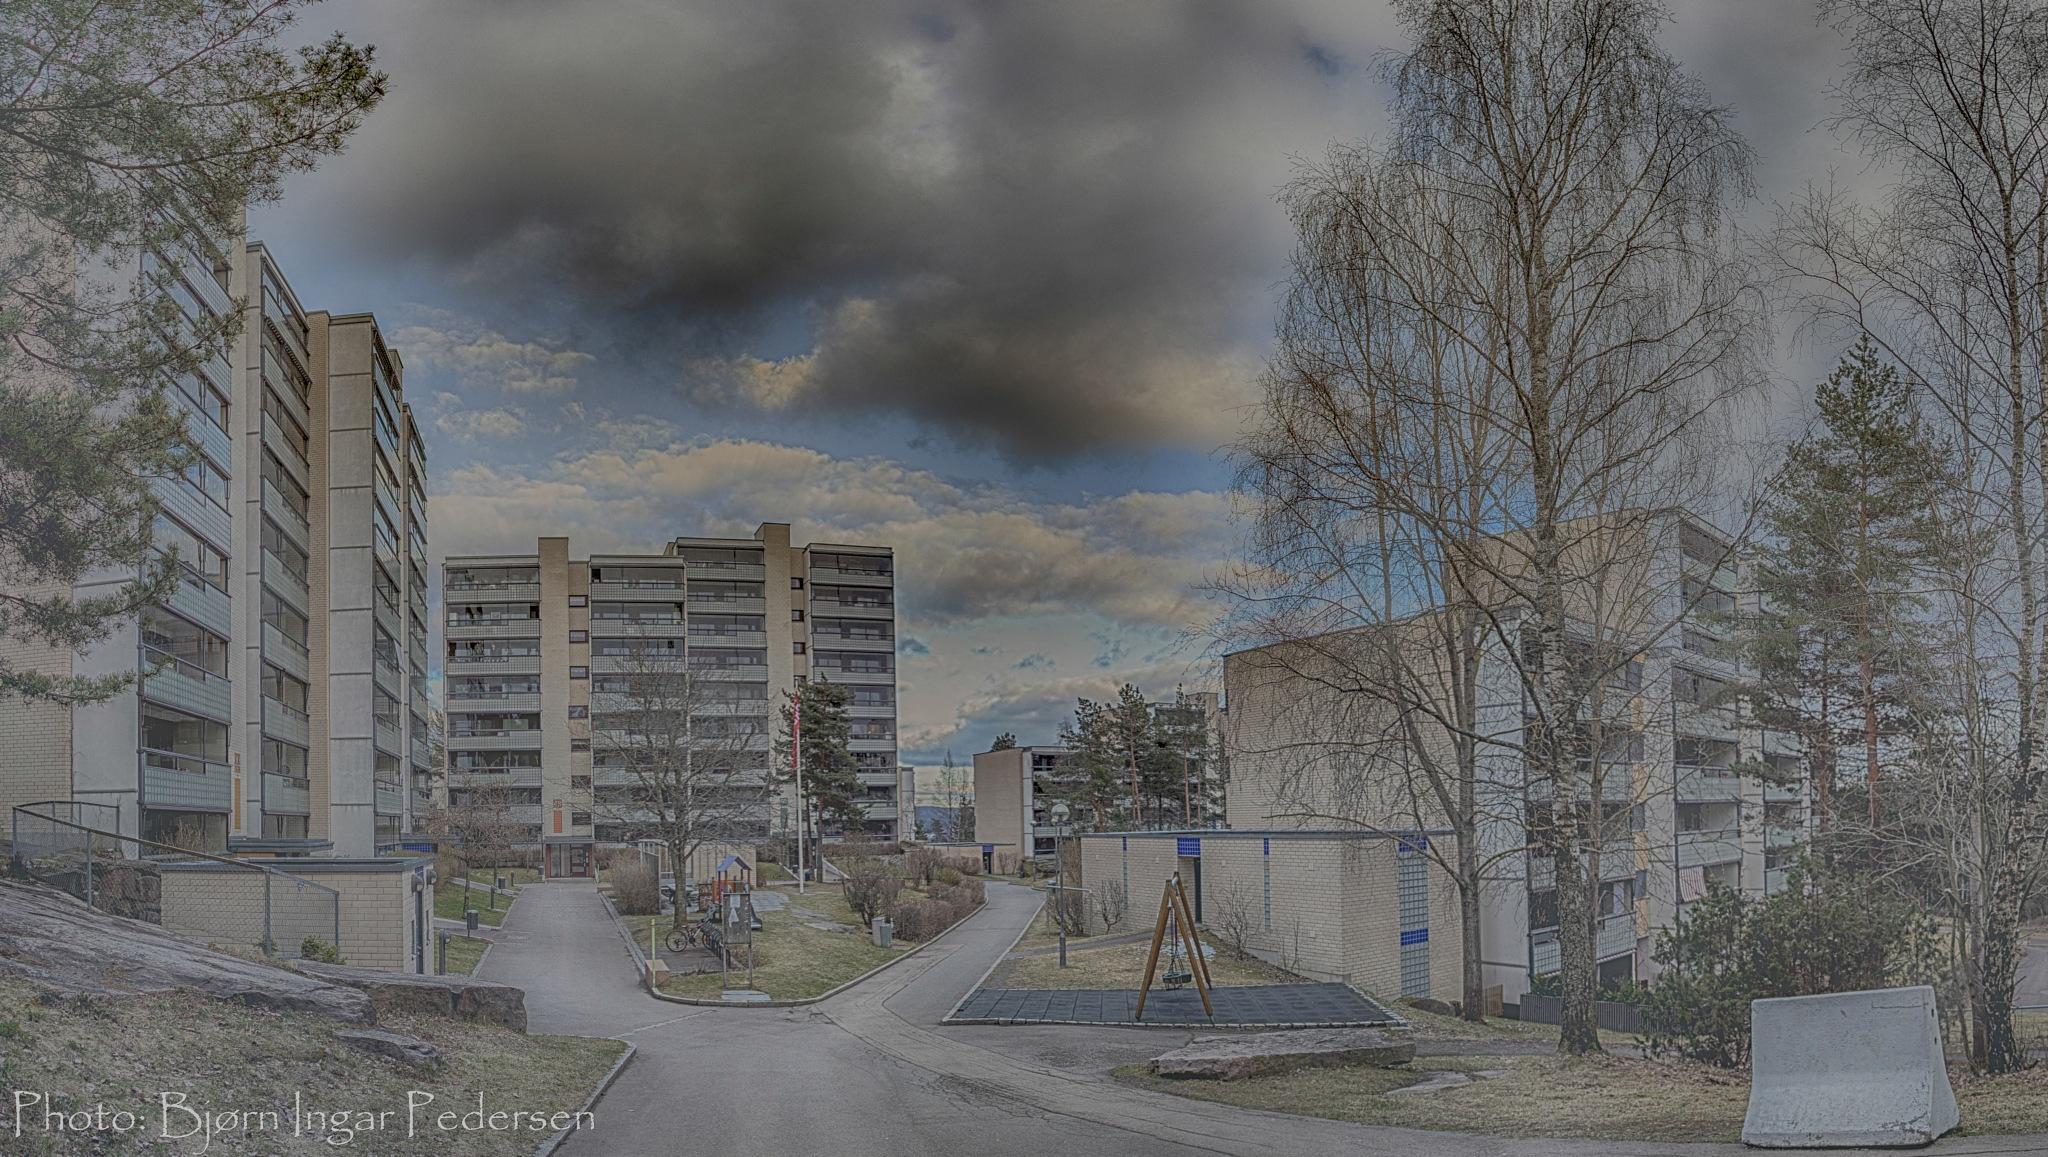 Romsås (a suburb to Oslo - Norway) by Bjørn Ingar Pedersen